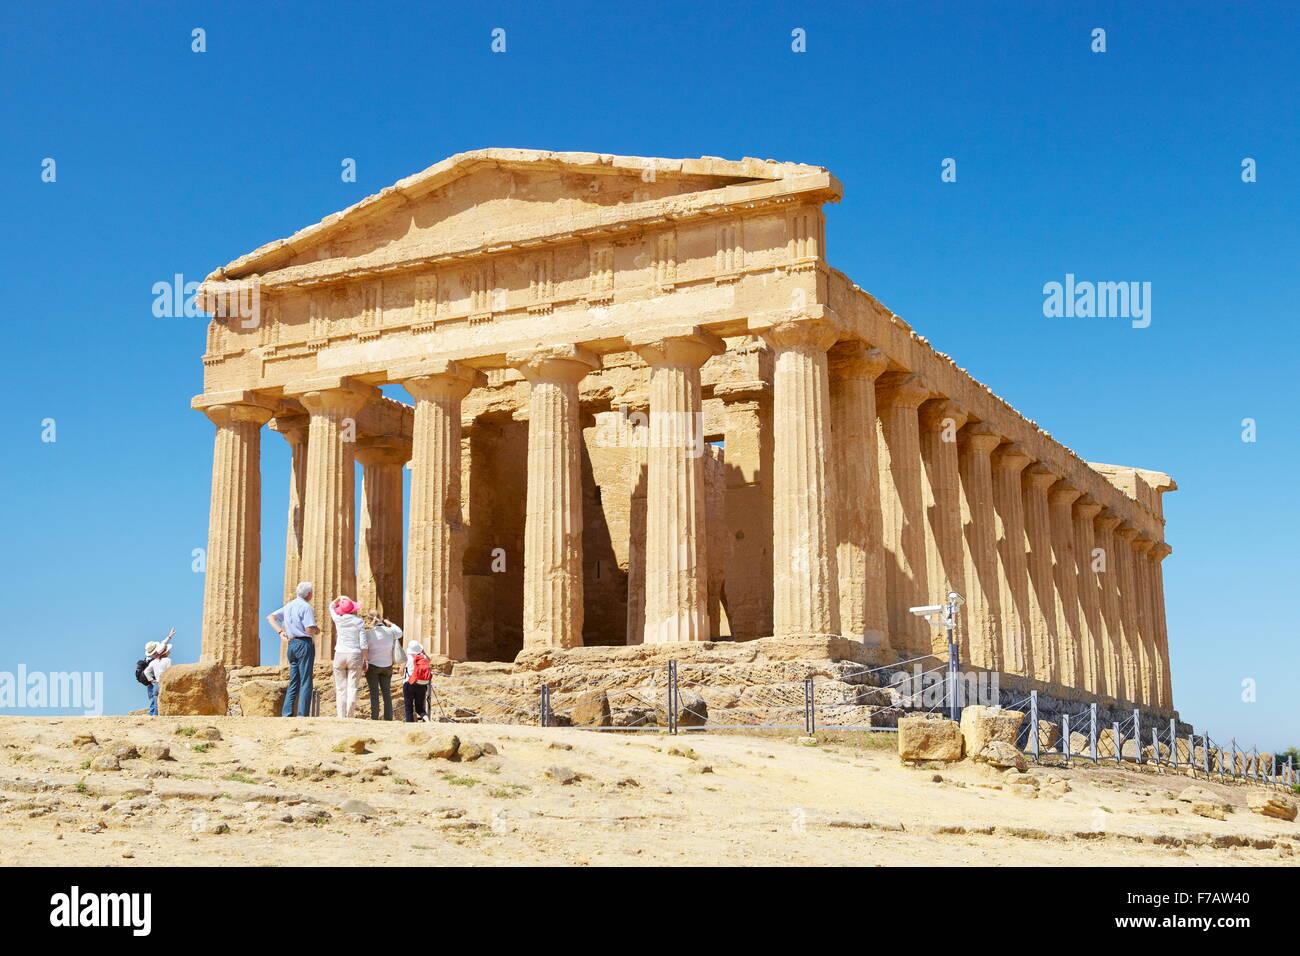 Agrigente - Temple of Concordia, Vallée des Temples (Valle dei Templi), Agrigente, Sicile, Italie l'UNESCO Photo Stock